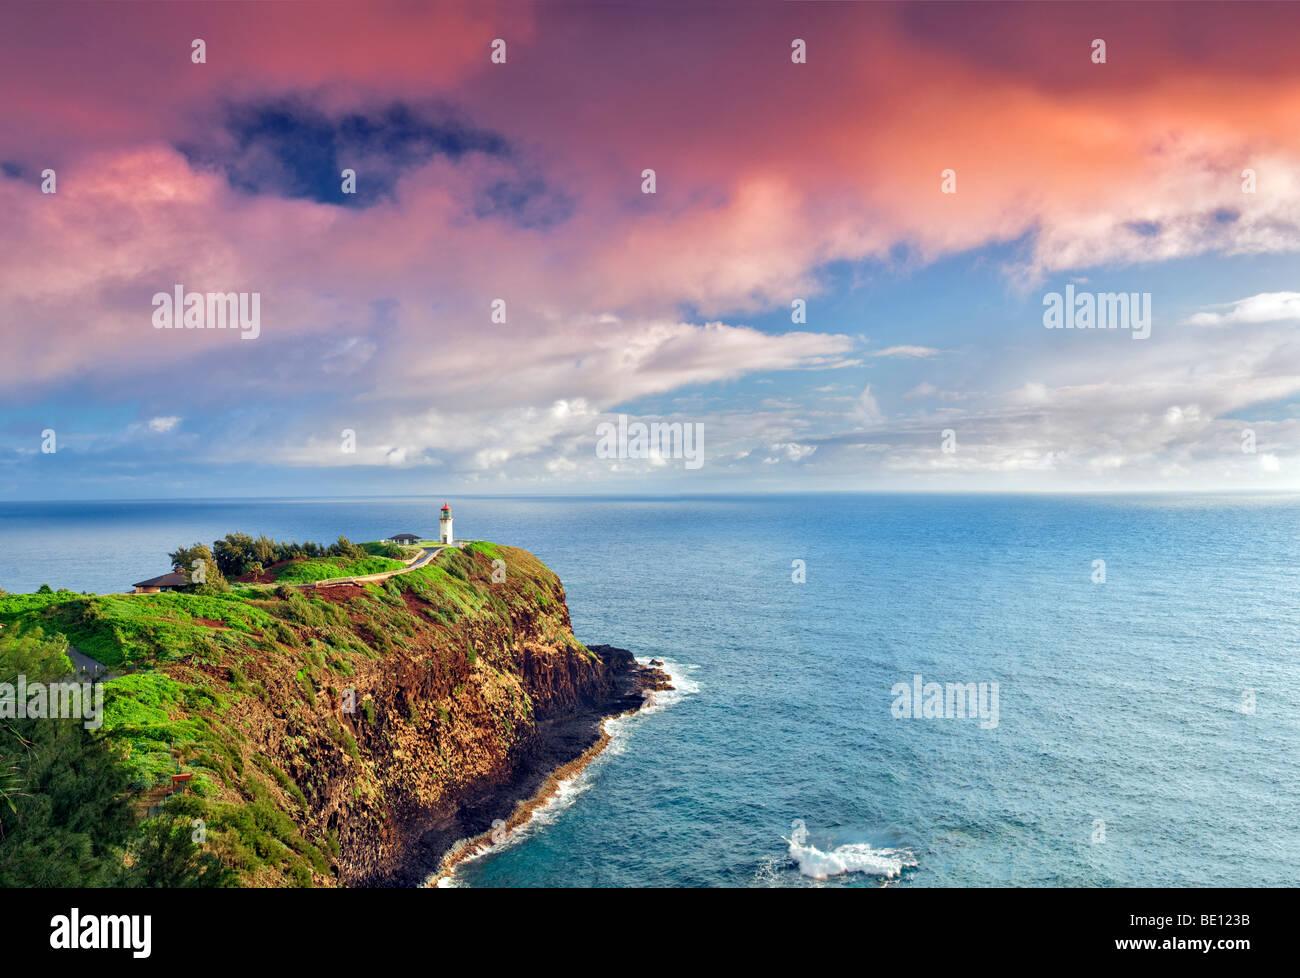 Kilauea Lighthouse. Kilauea Point National Wildlife Refuge, Kauai, Hawaii. - Stock Image